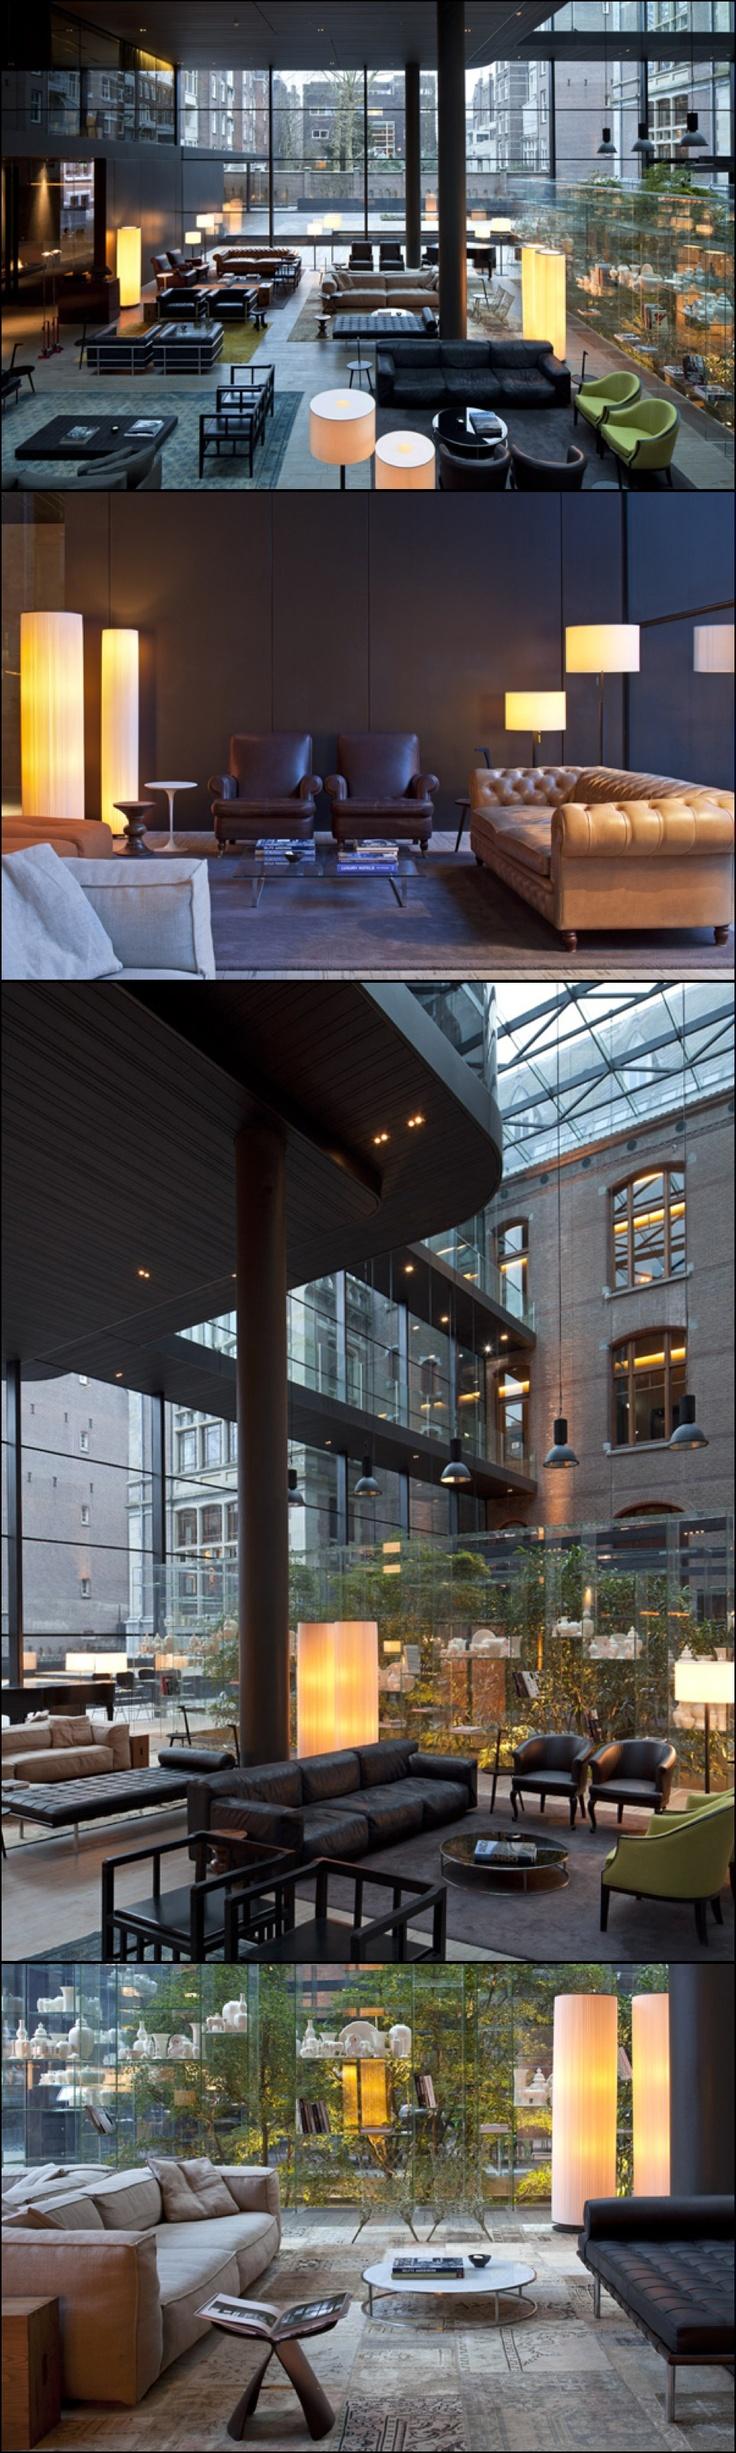 http://www.urdesign.it/index.php/2012/05/31/conservatorium-hotel-amsterdam-piero-lissoni/